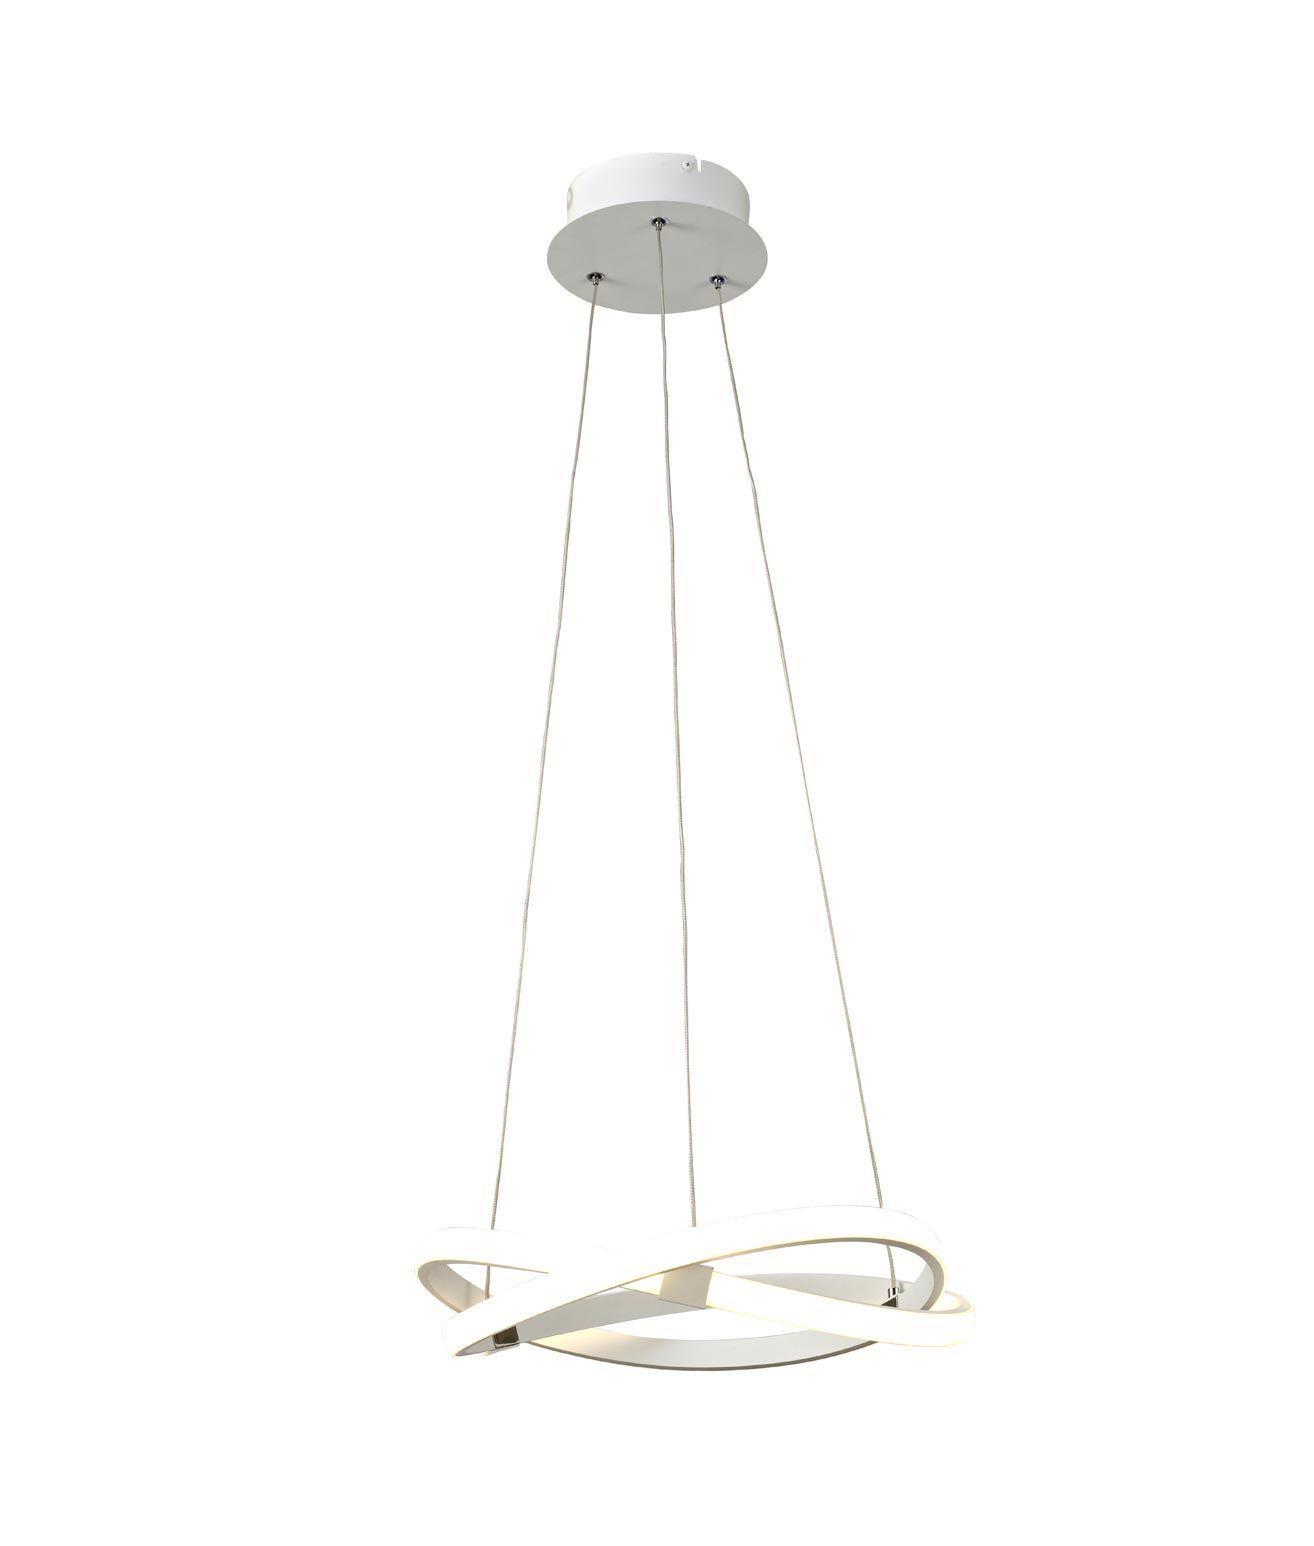 Lámparas colgante moderna INFINITY LED